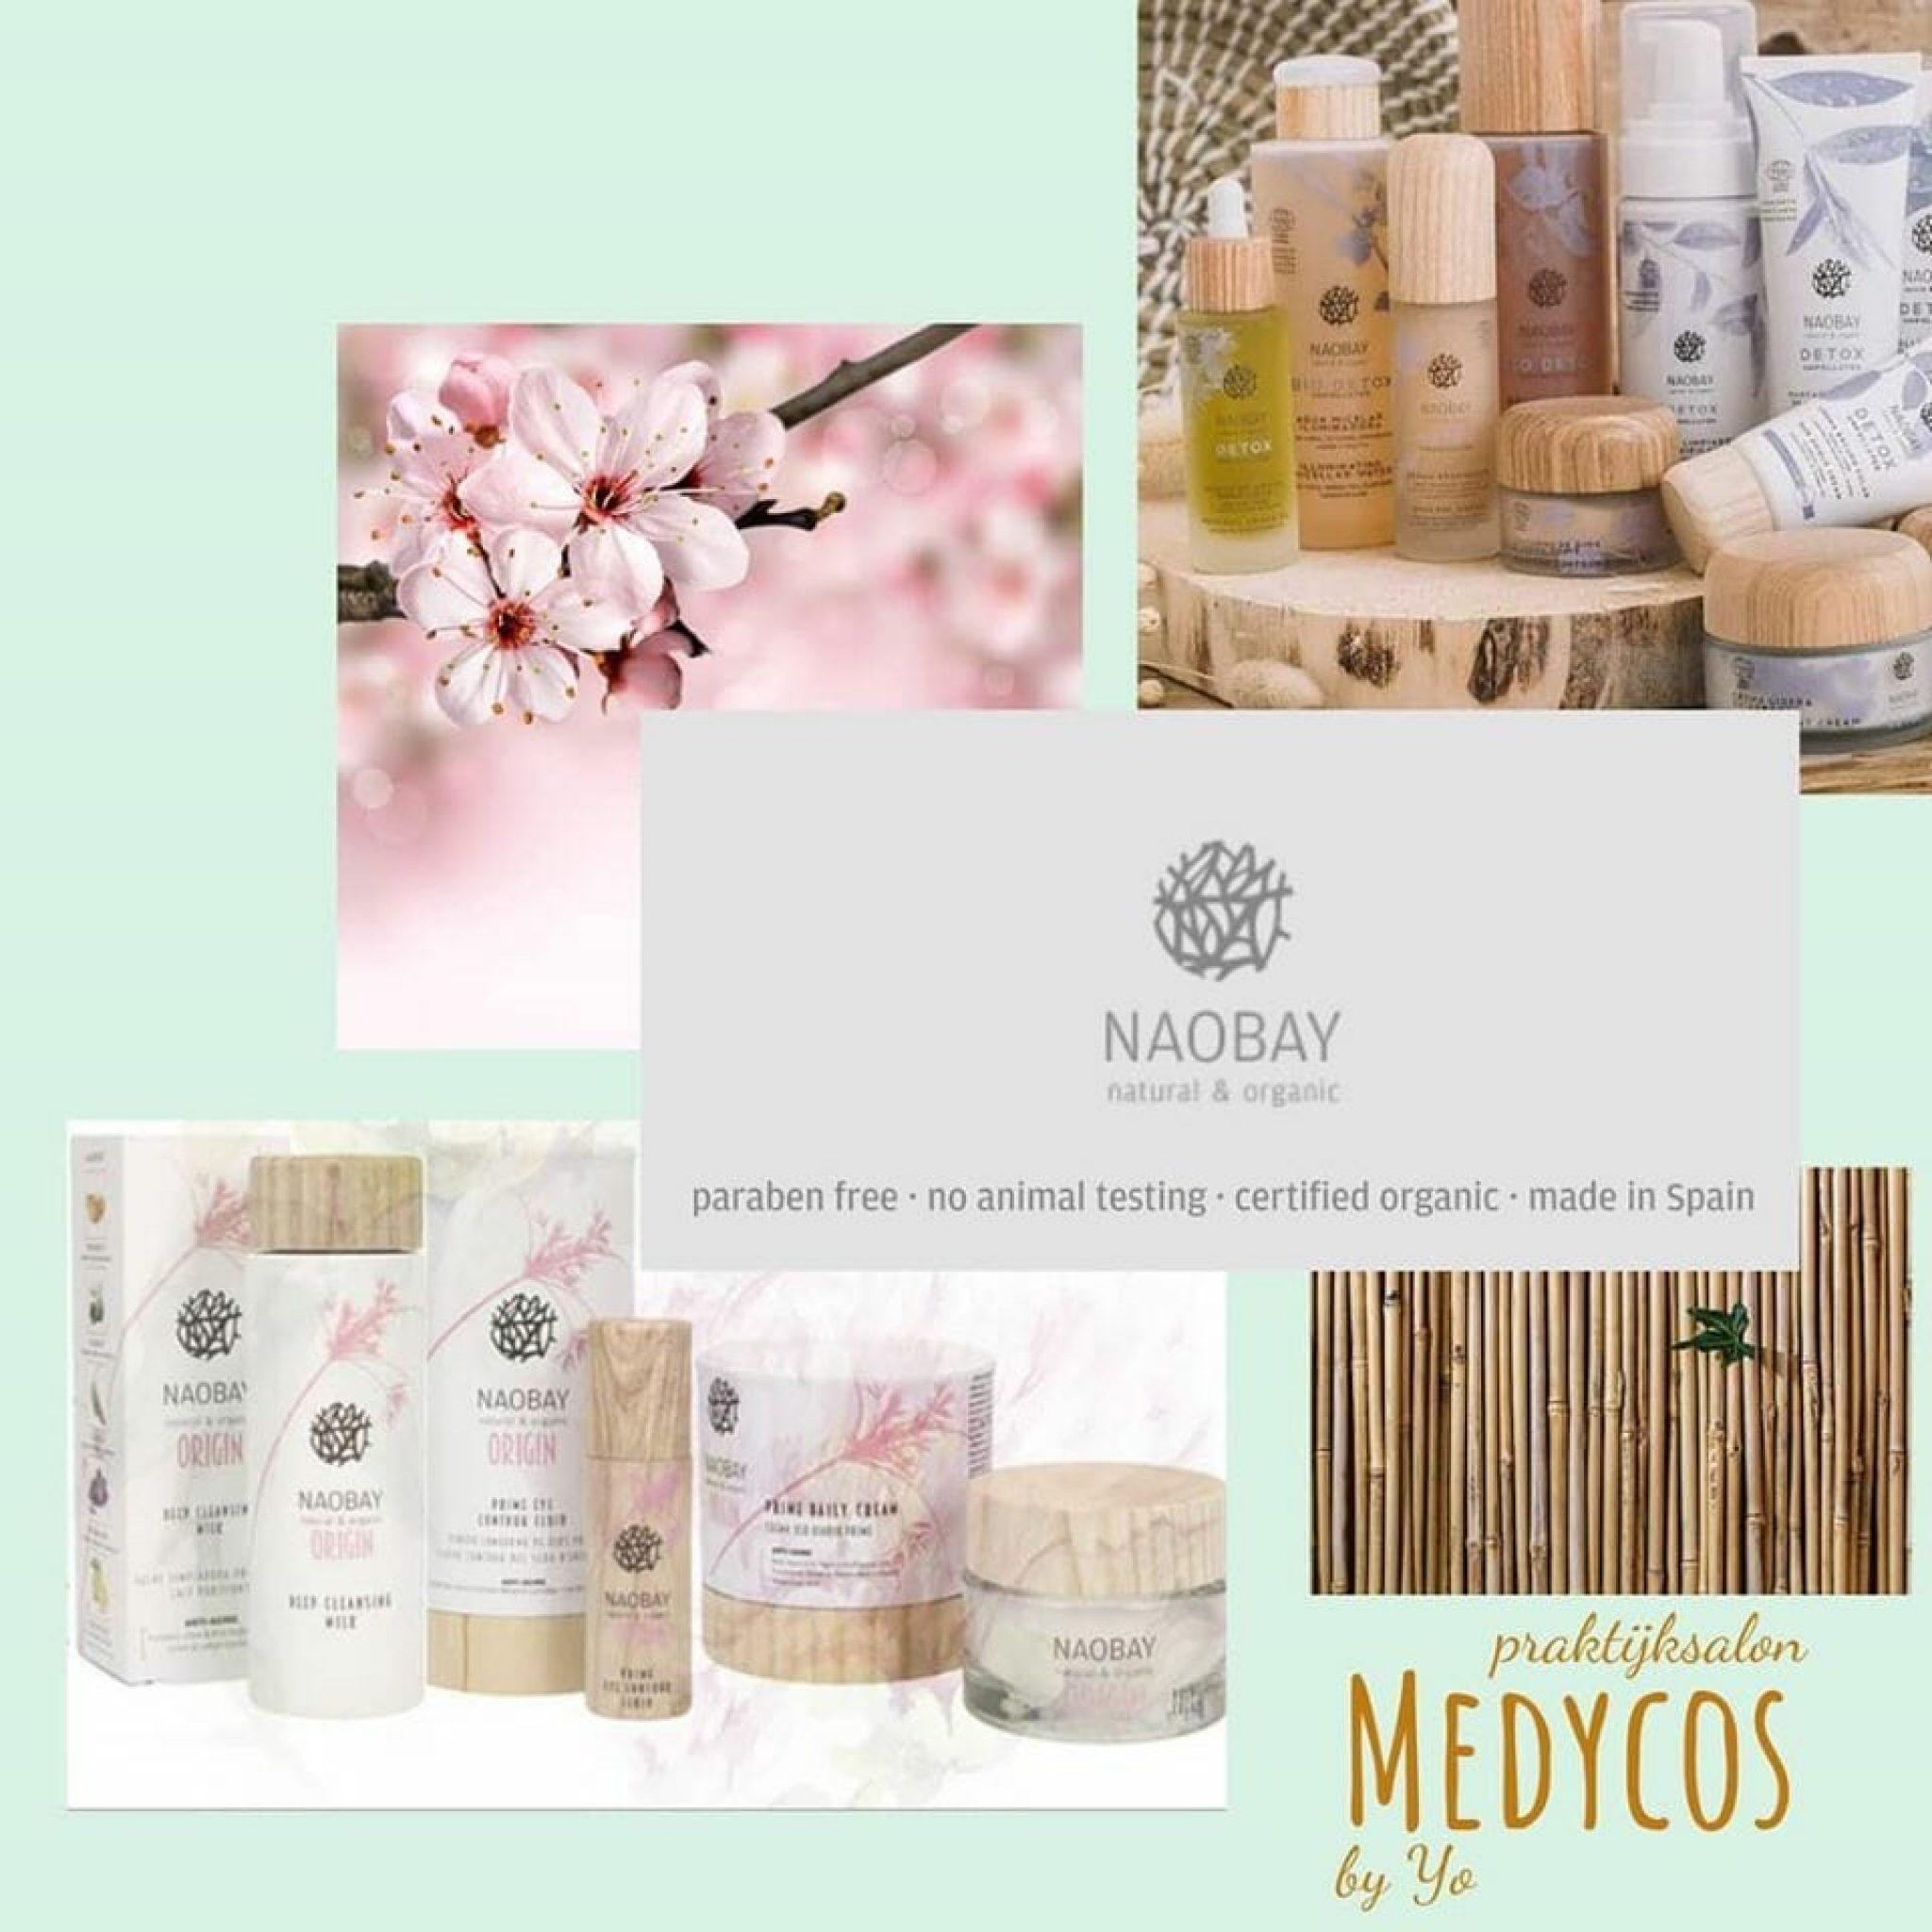 Medycos.com - schoonheidsspecialiste en NAOBAY Depositair Schoonheidssalon in Hellevoetsluis